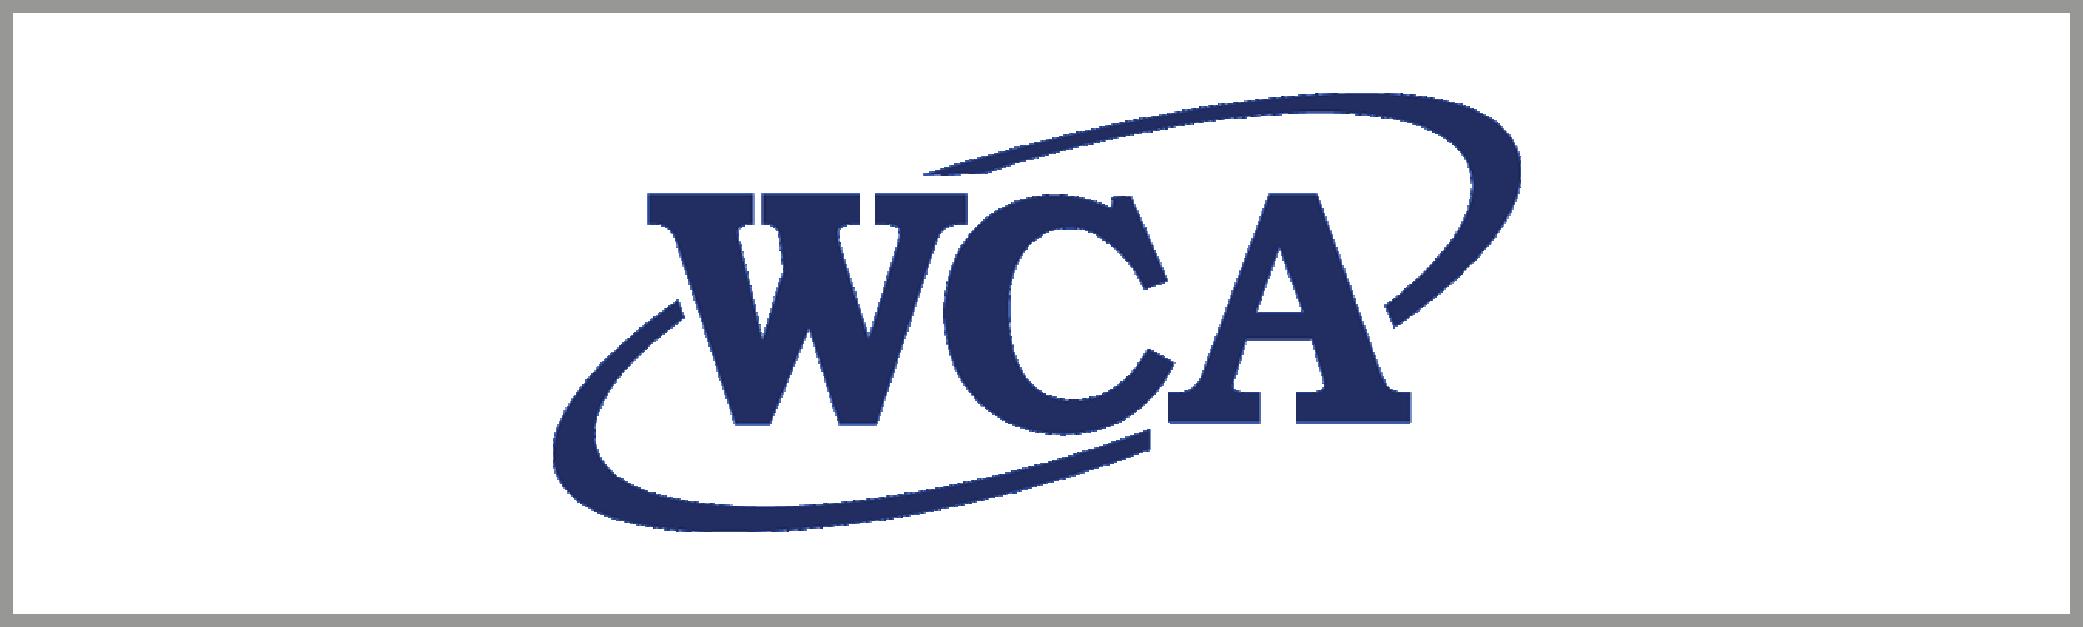 Waste-Management-and-Logistic-Data-Virtualization-Use-Case